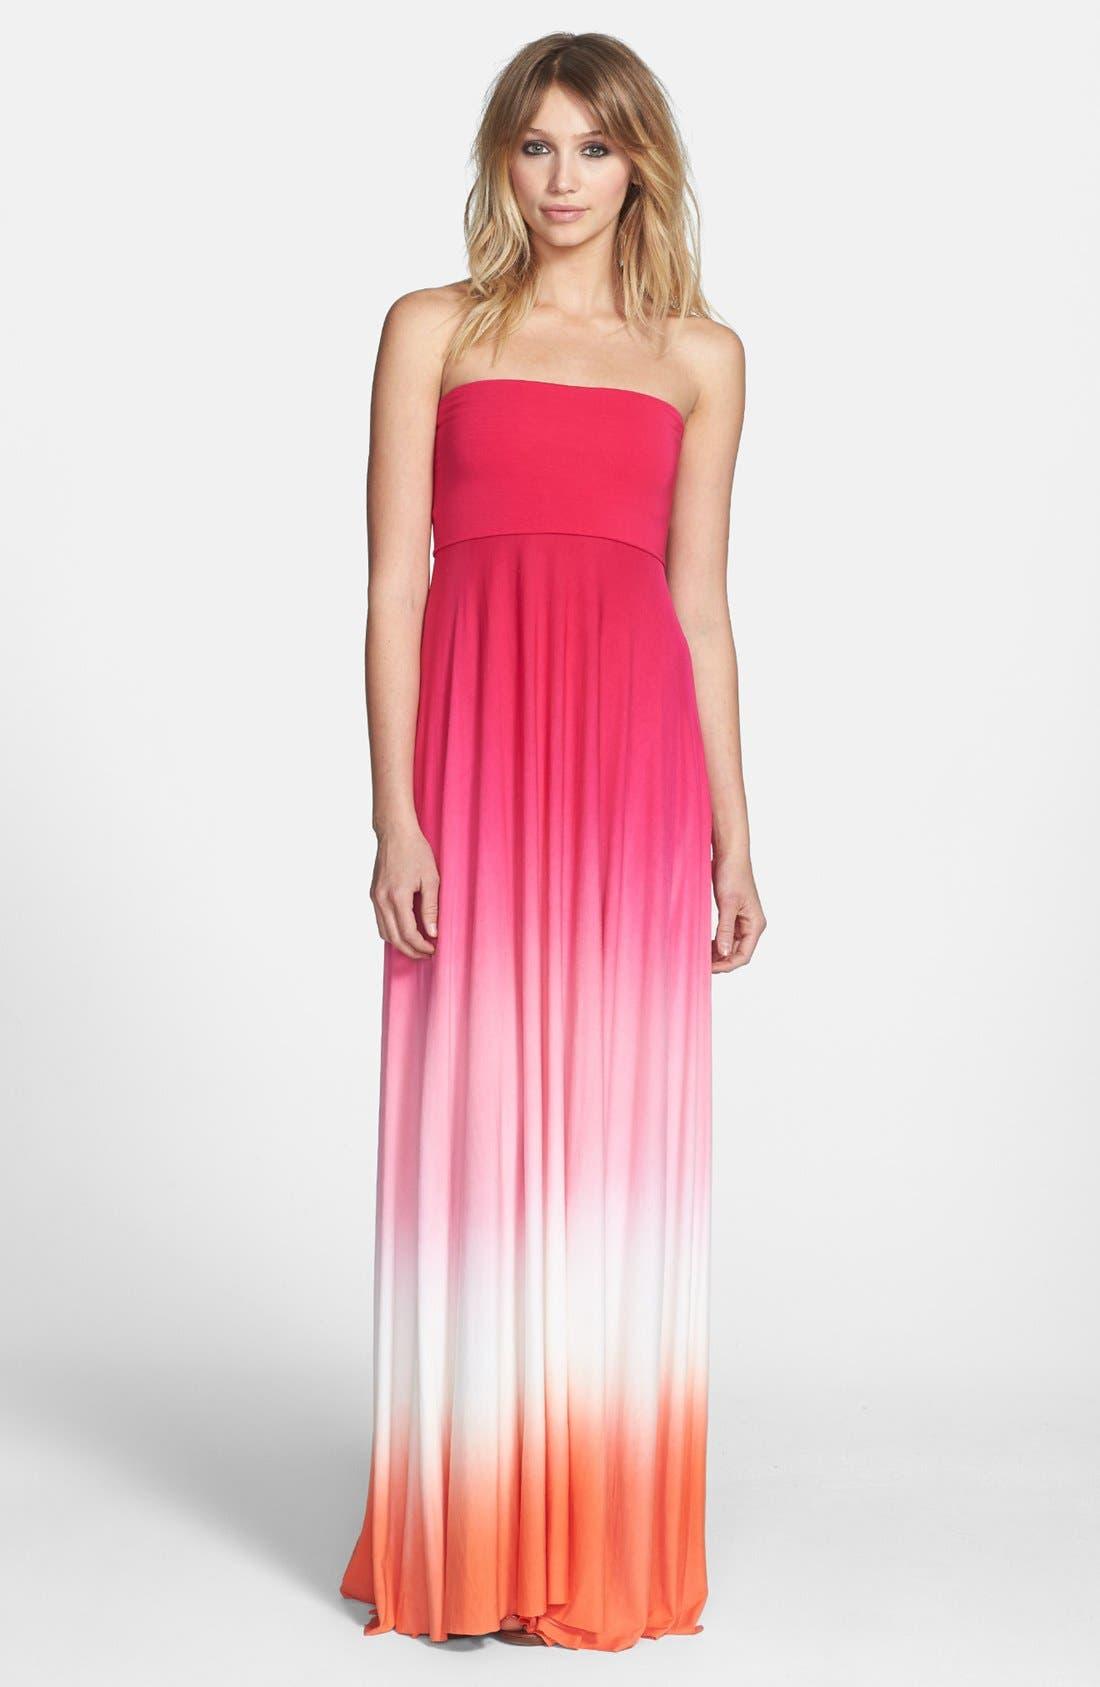 Main Image - Young, Fabulous & Broke 'Bangal' Convertible Maxi Dress